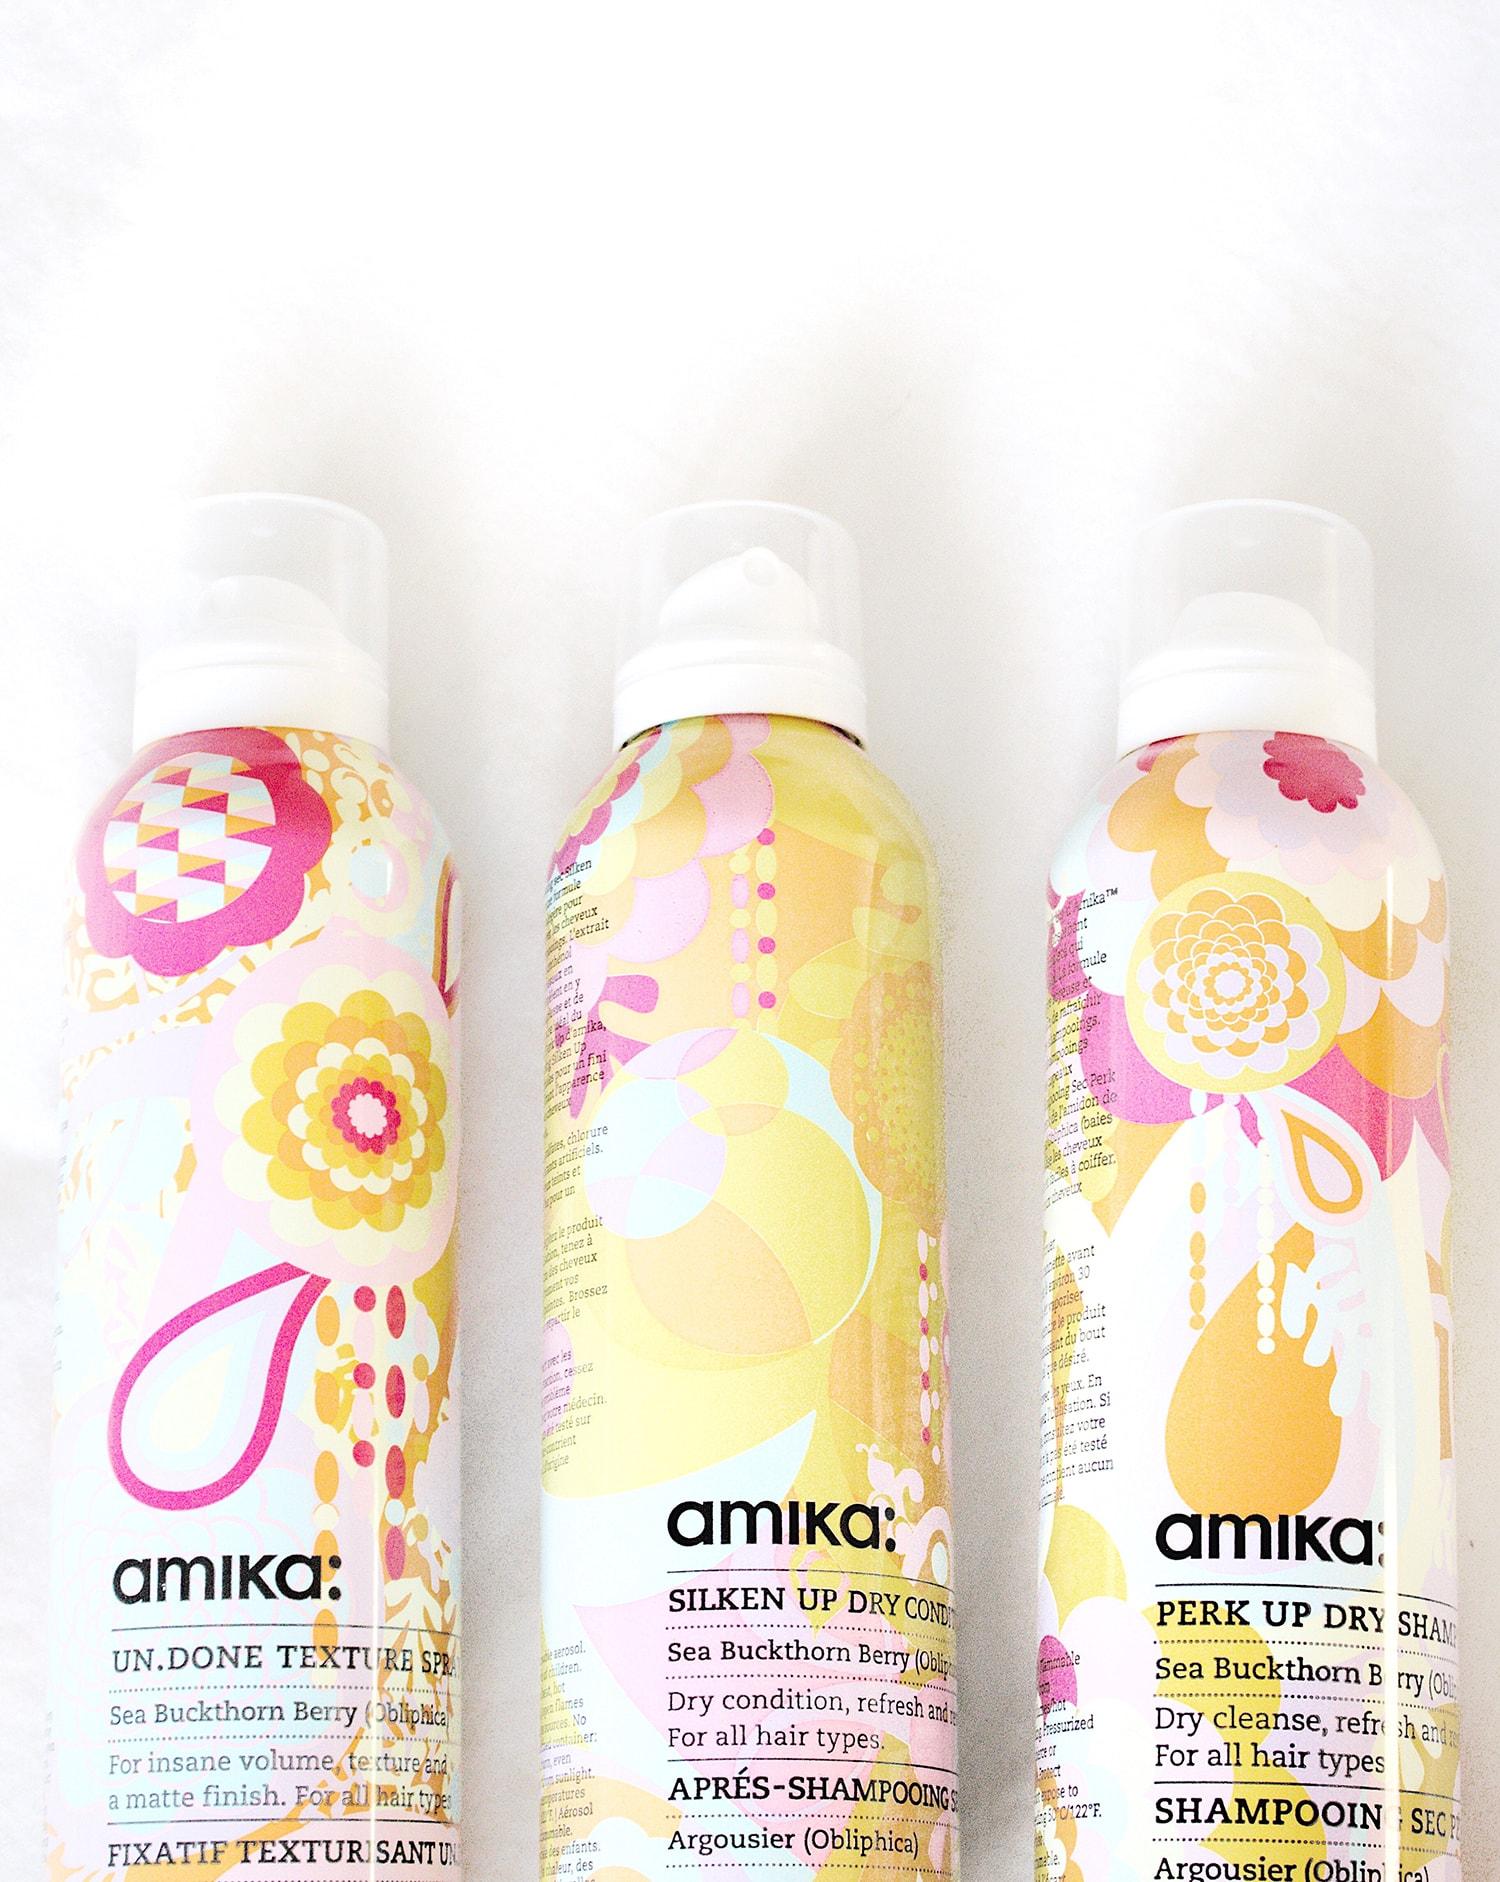 amika dry shampoo and conditioner